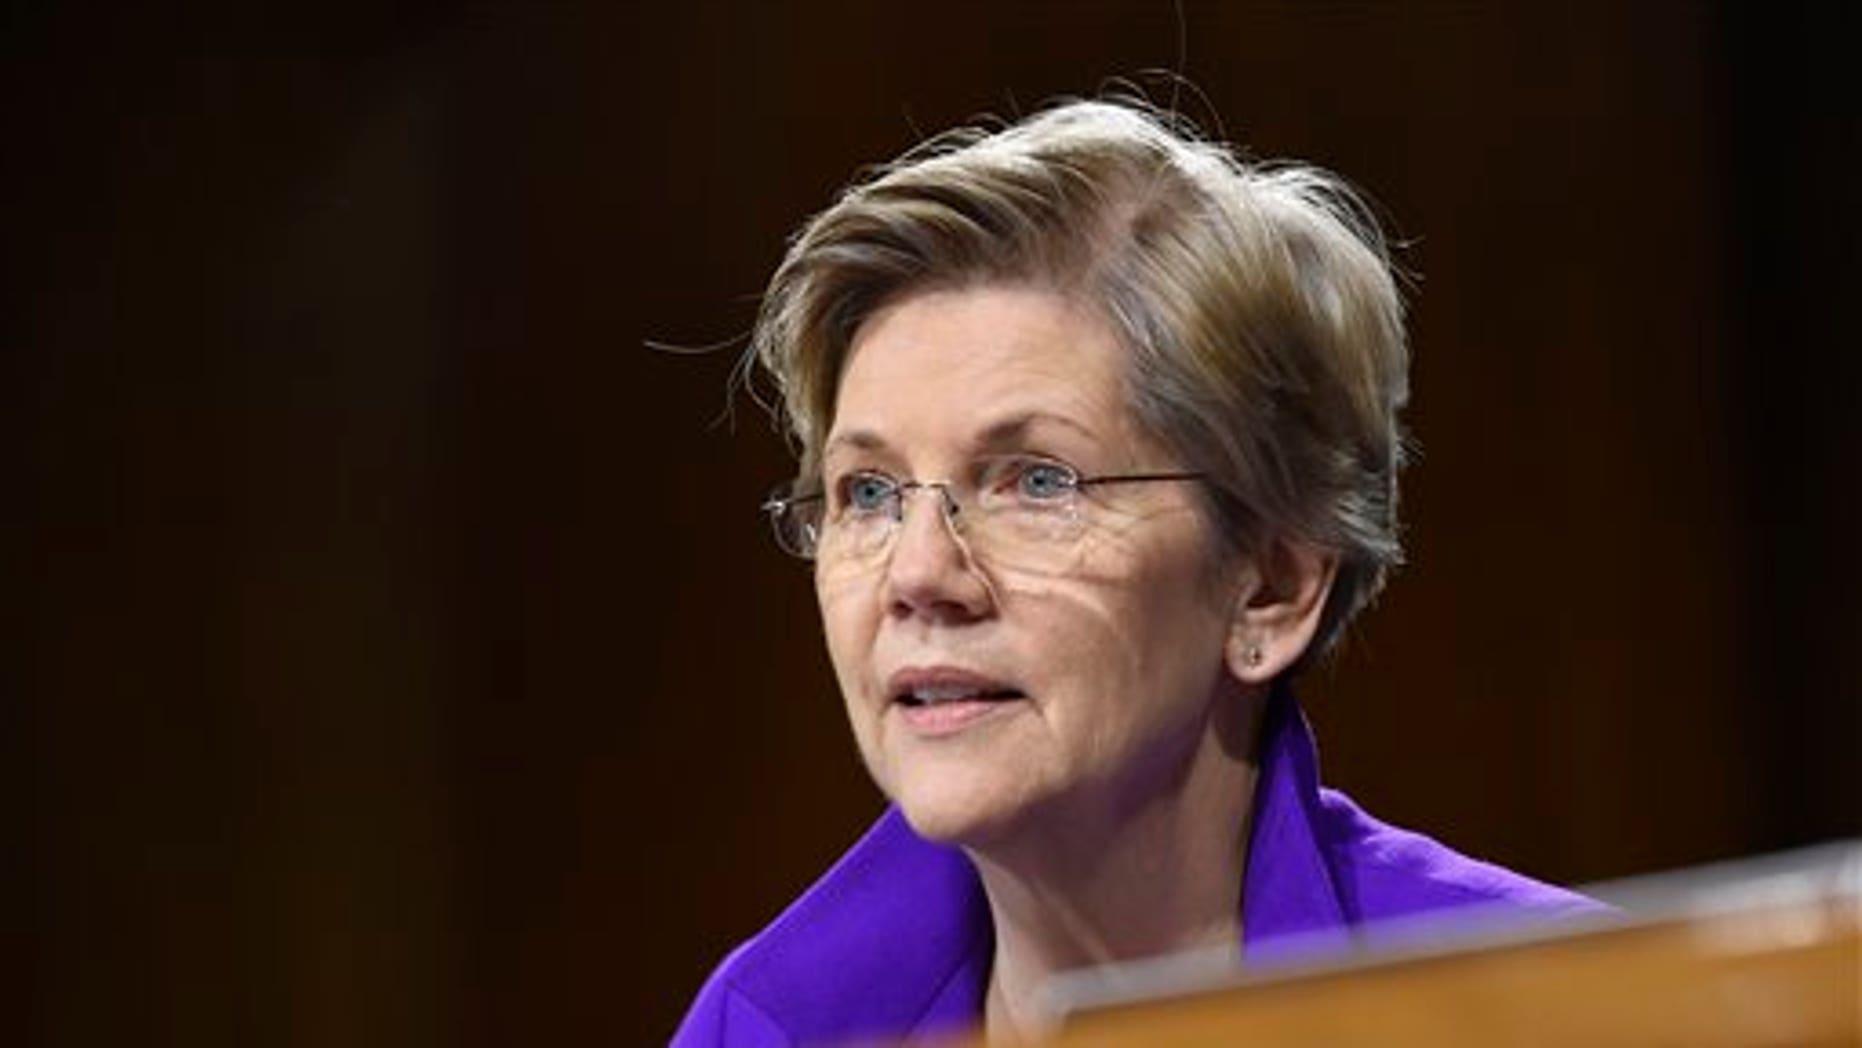 FILE - In this Feb. 24, 2015, file photo, Sen. Elizabeth Warren, D-Mass., is seen on Capitol Hill in Washington. (AP Photo/Susan Walsh, File)